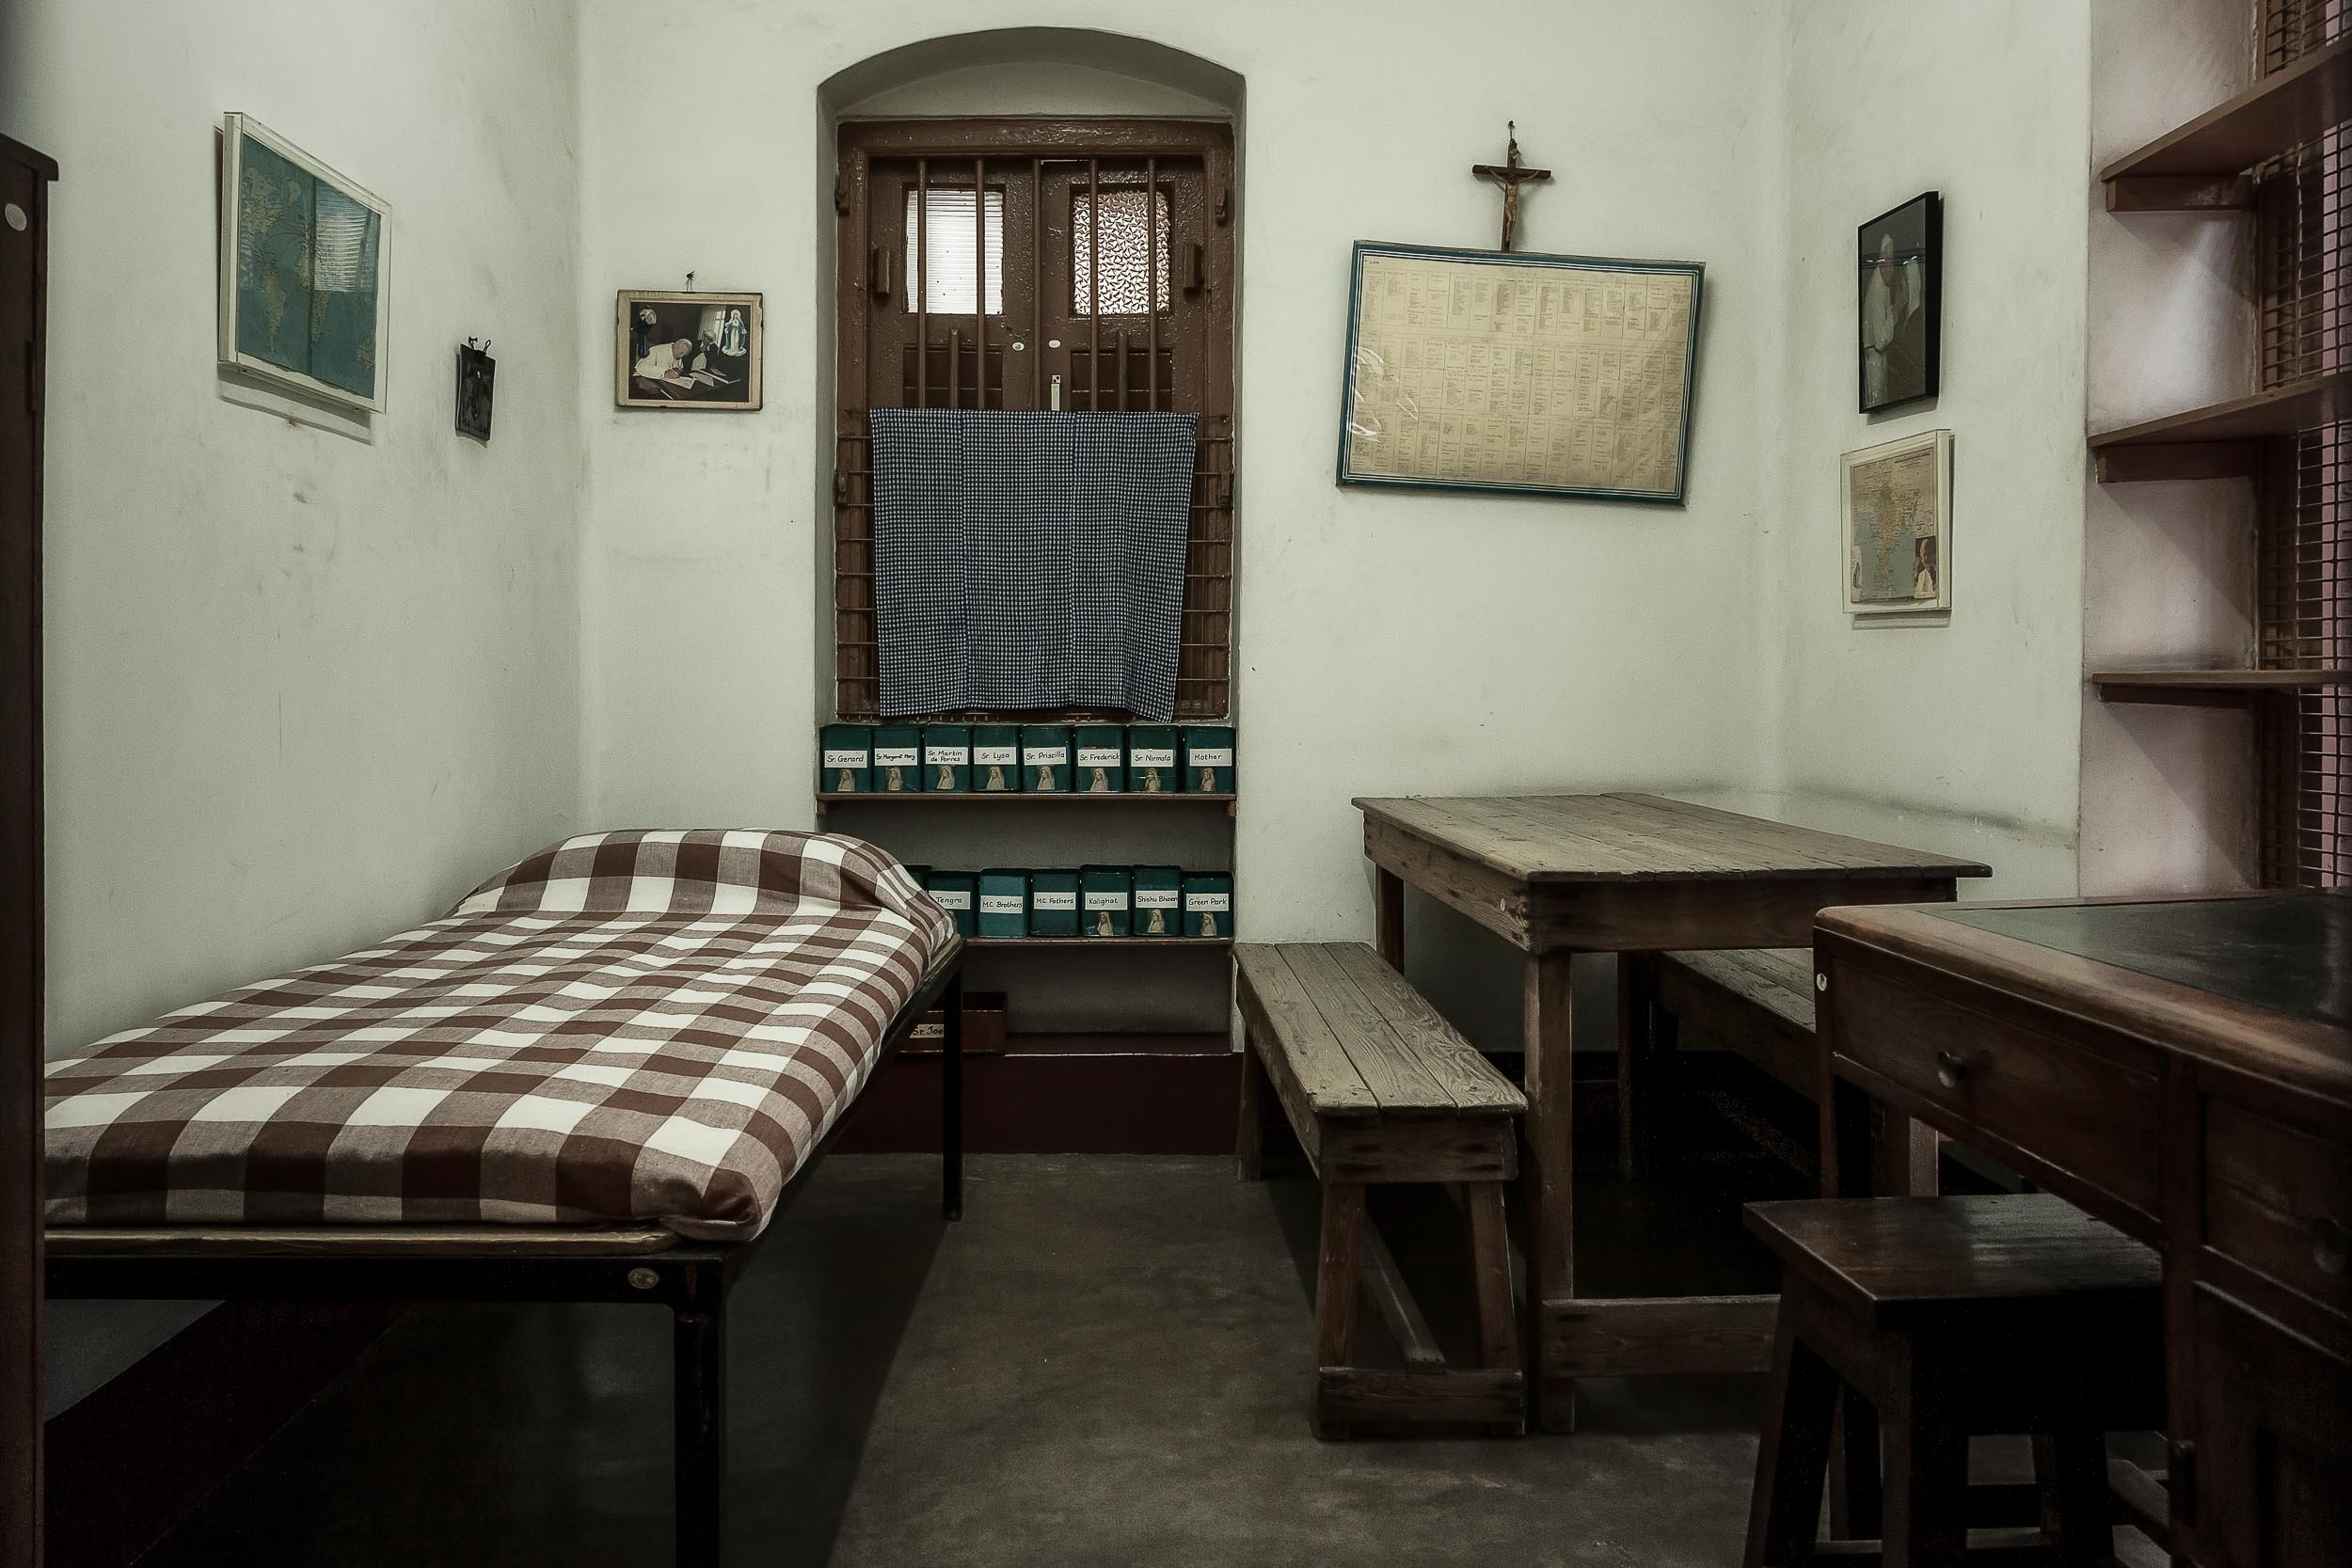 Mother Teresa's Bedroom, Kolkata, India